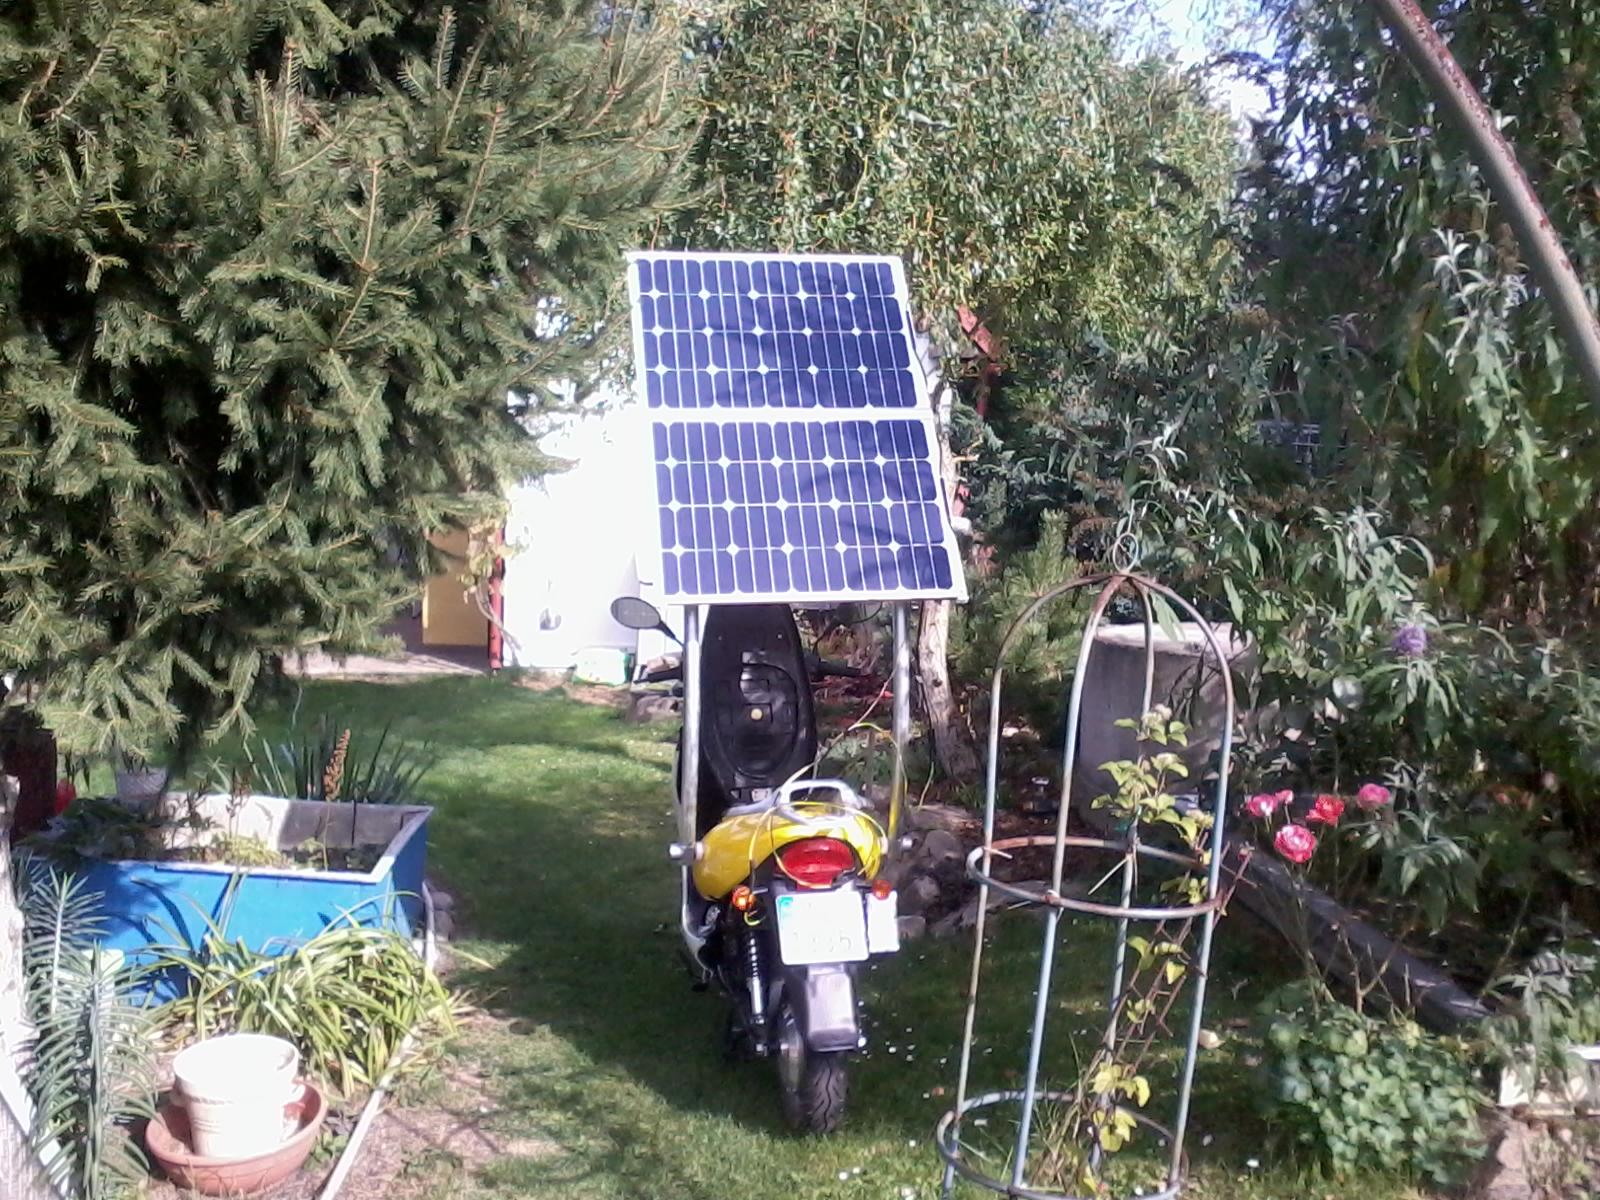 Solární elektroskútr.